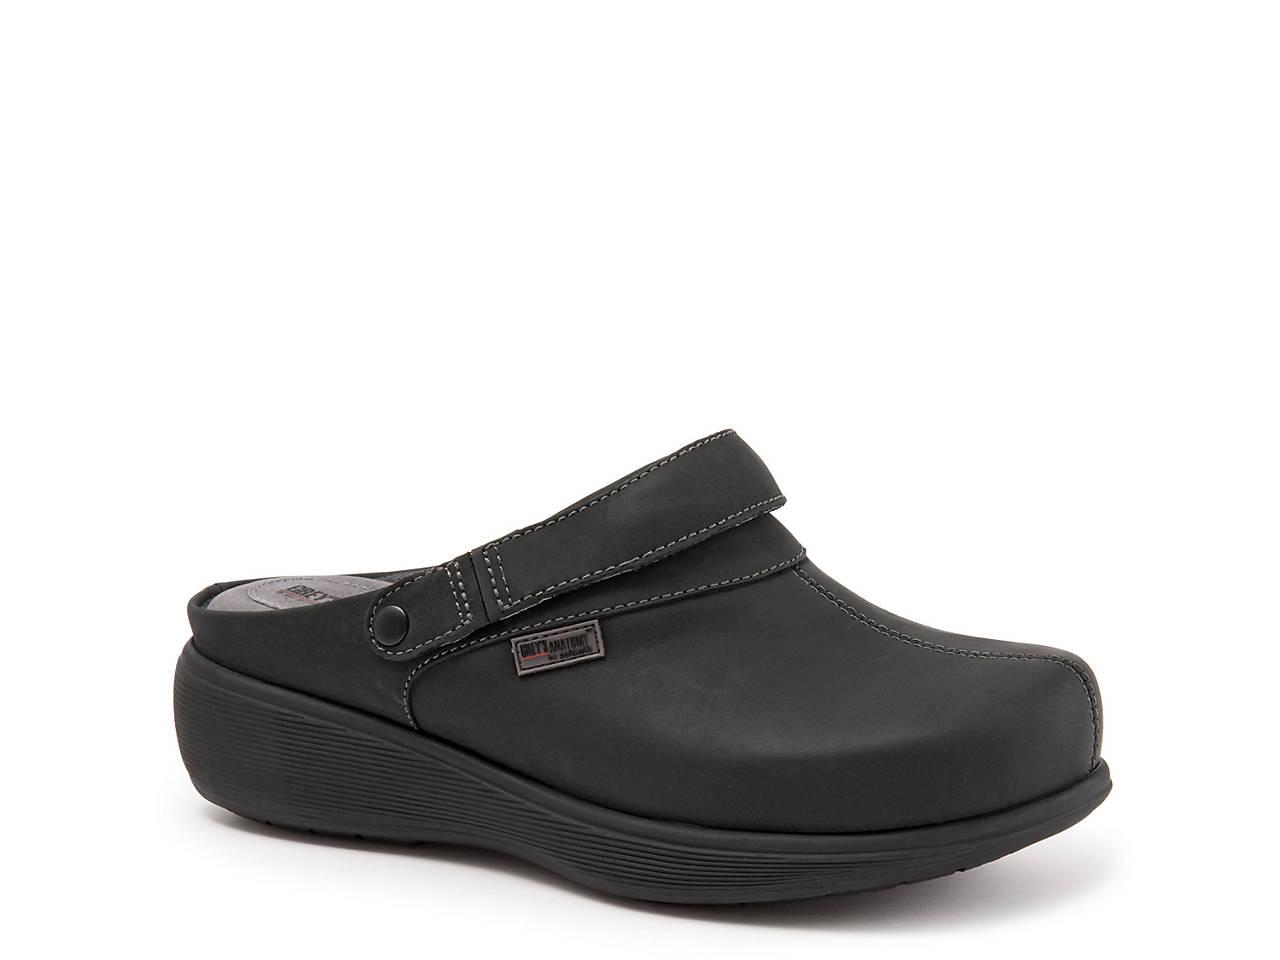 Grey\'s Anatomy by Softwalk Edge Pro Work Clog Women\'s Shoes   DSW